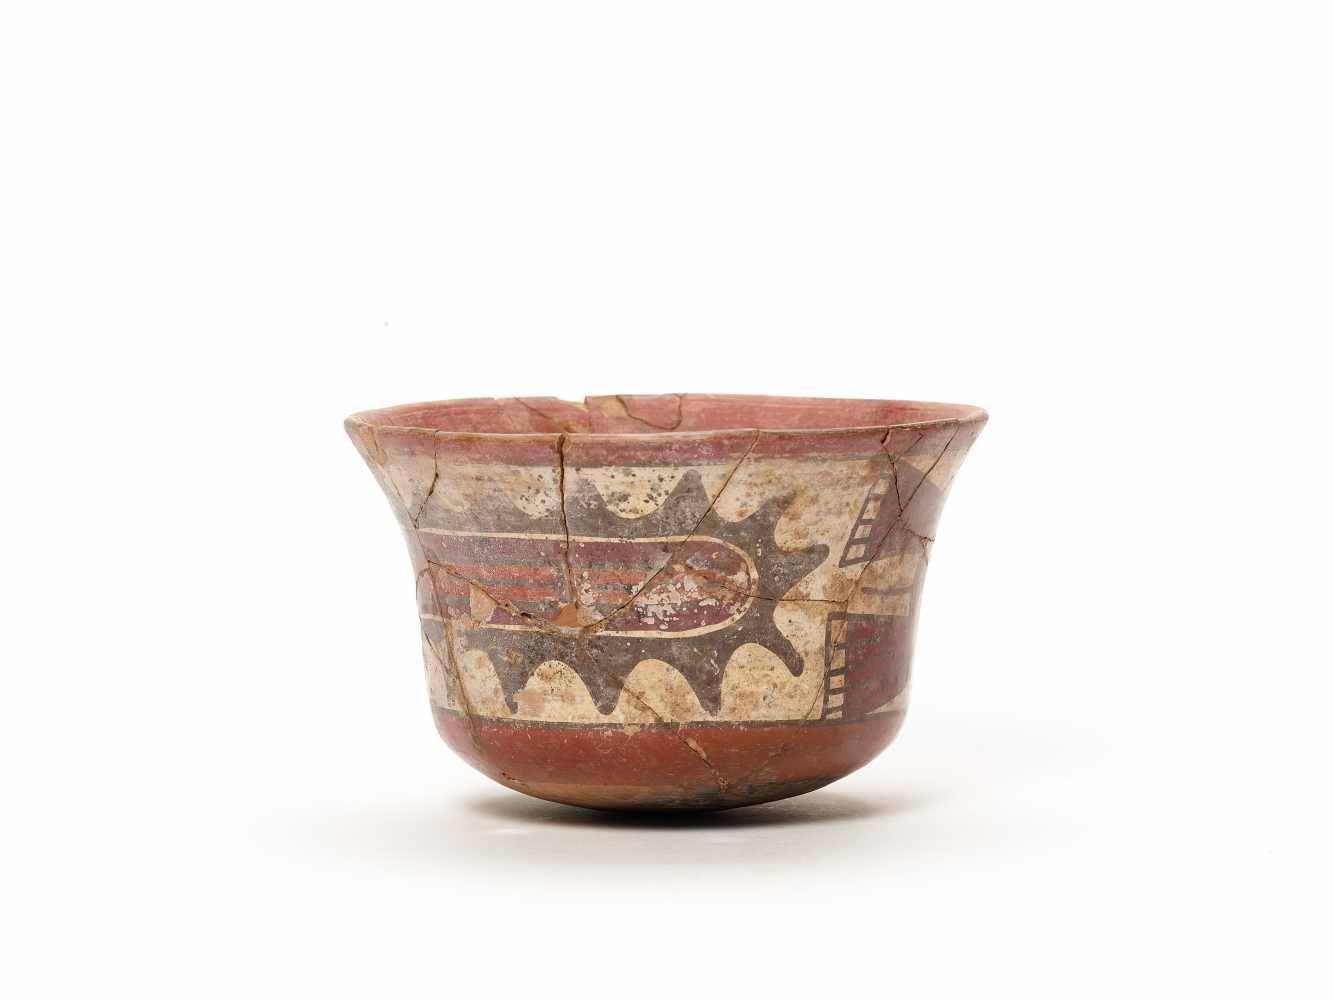 BOWL WITH GOD REPRESENTATION - NAZCA, PERU, C. 300-600 ADPainted clayNazca, Peru, c. 300-600 - Image 3 of 3